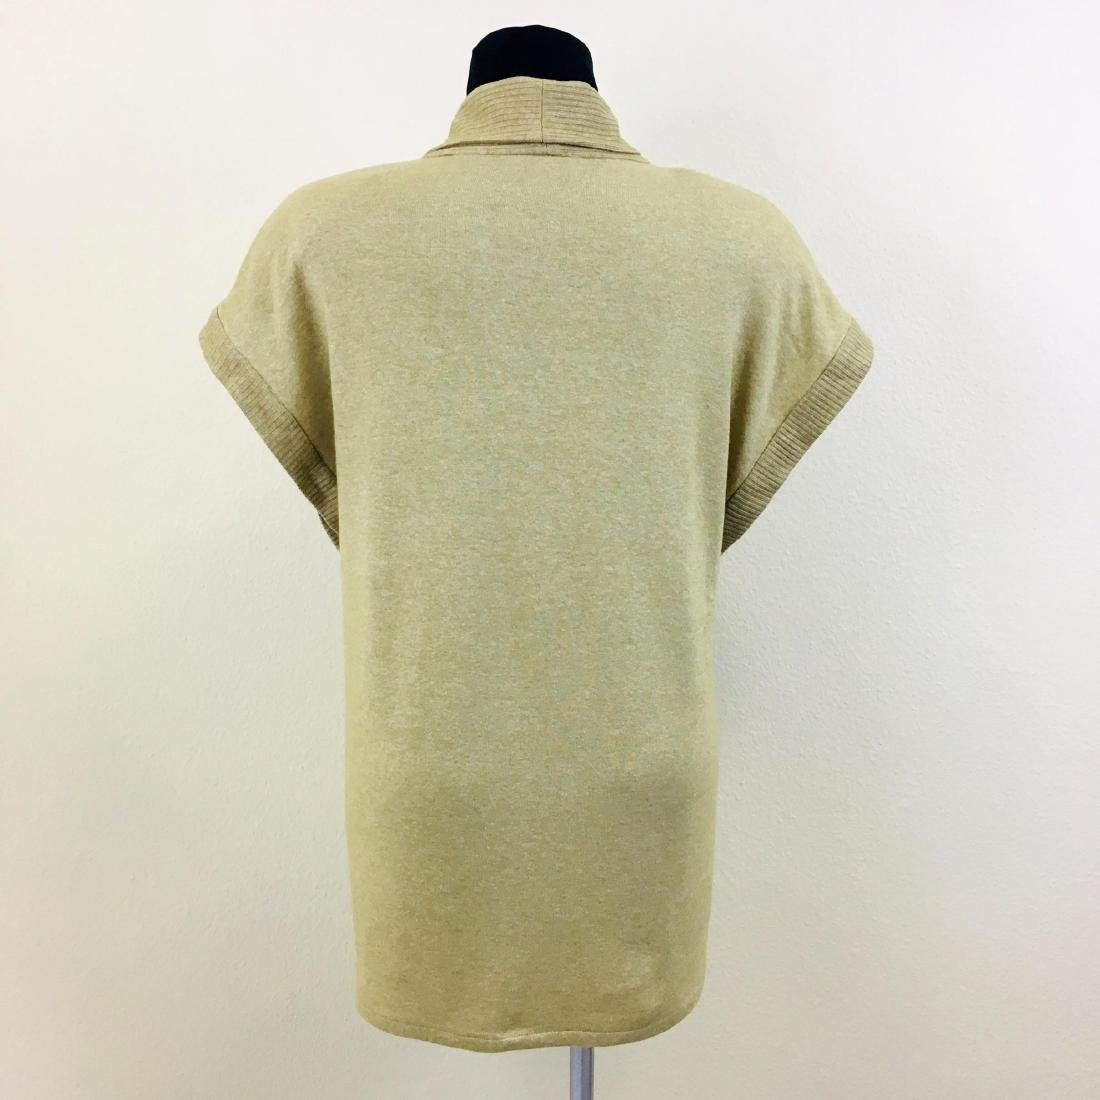 Women's Creation Charmante Wool Blend Cardigan Sweater - 5